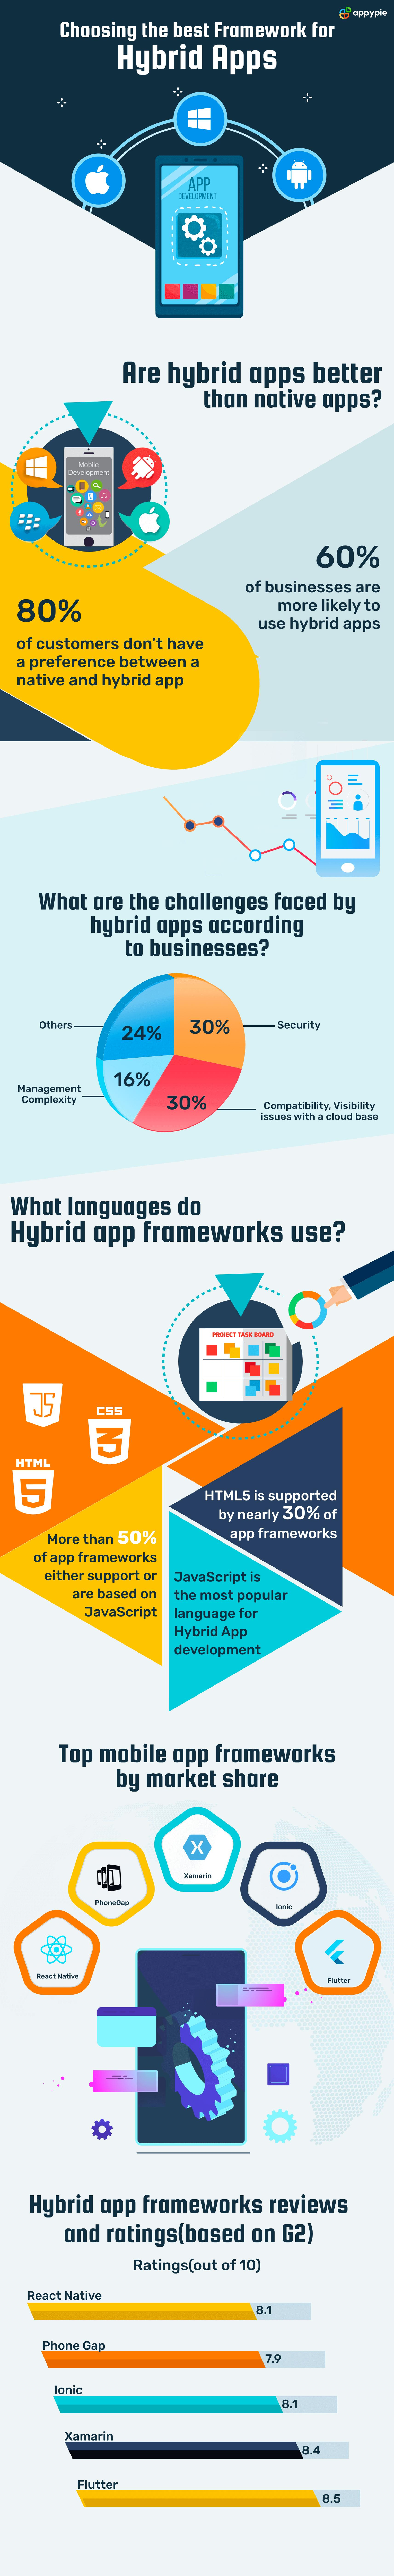 Hybrid App Framework - Appy Pie